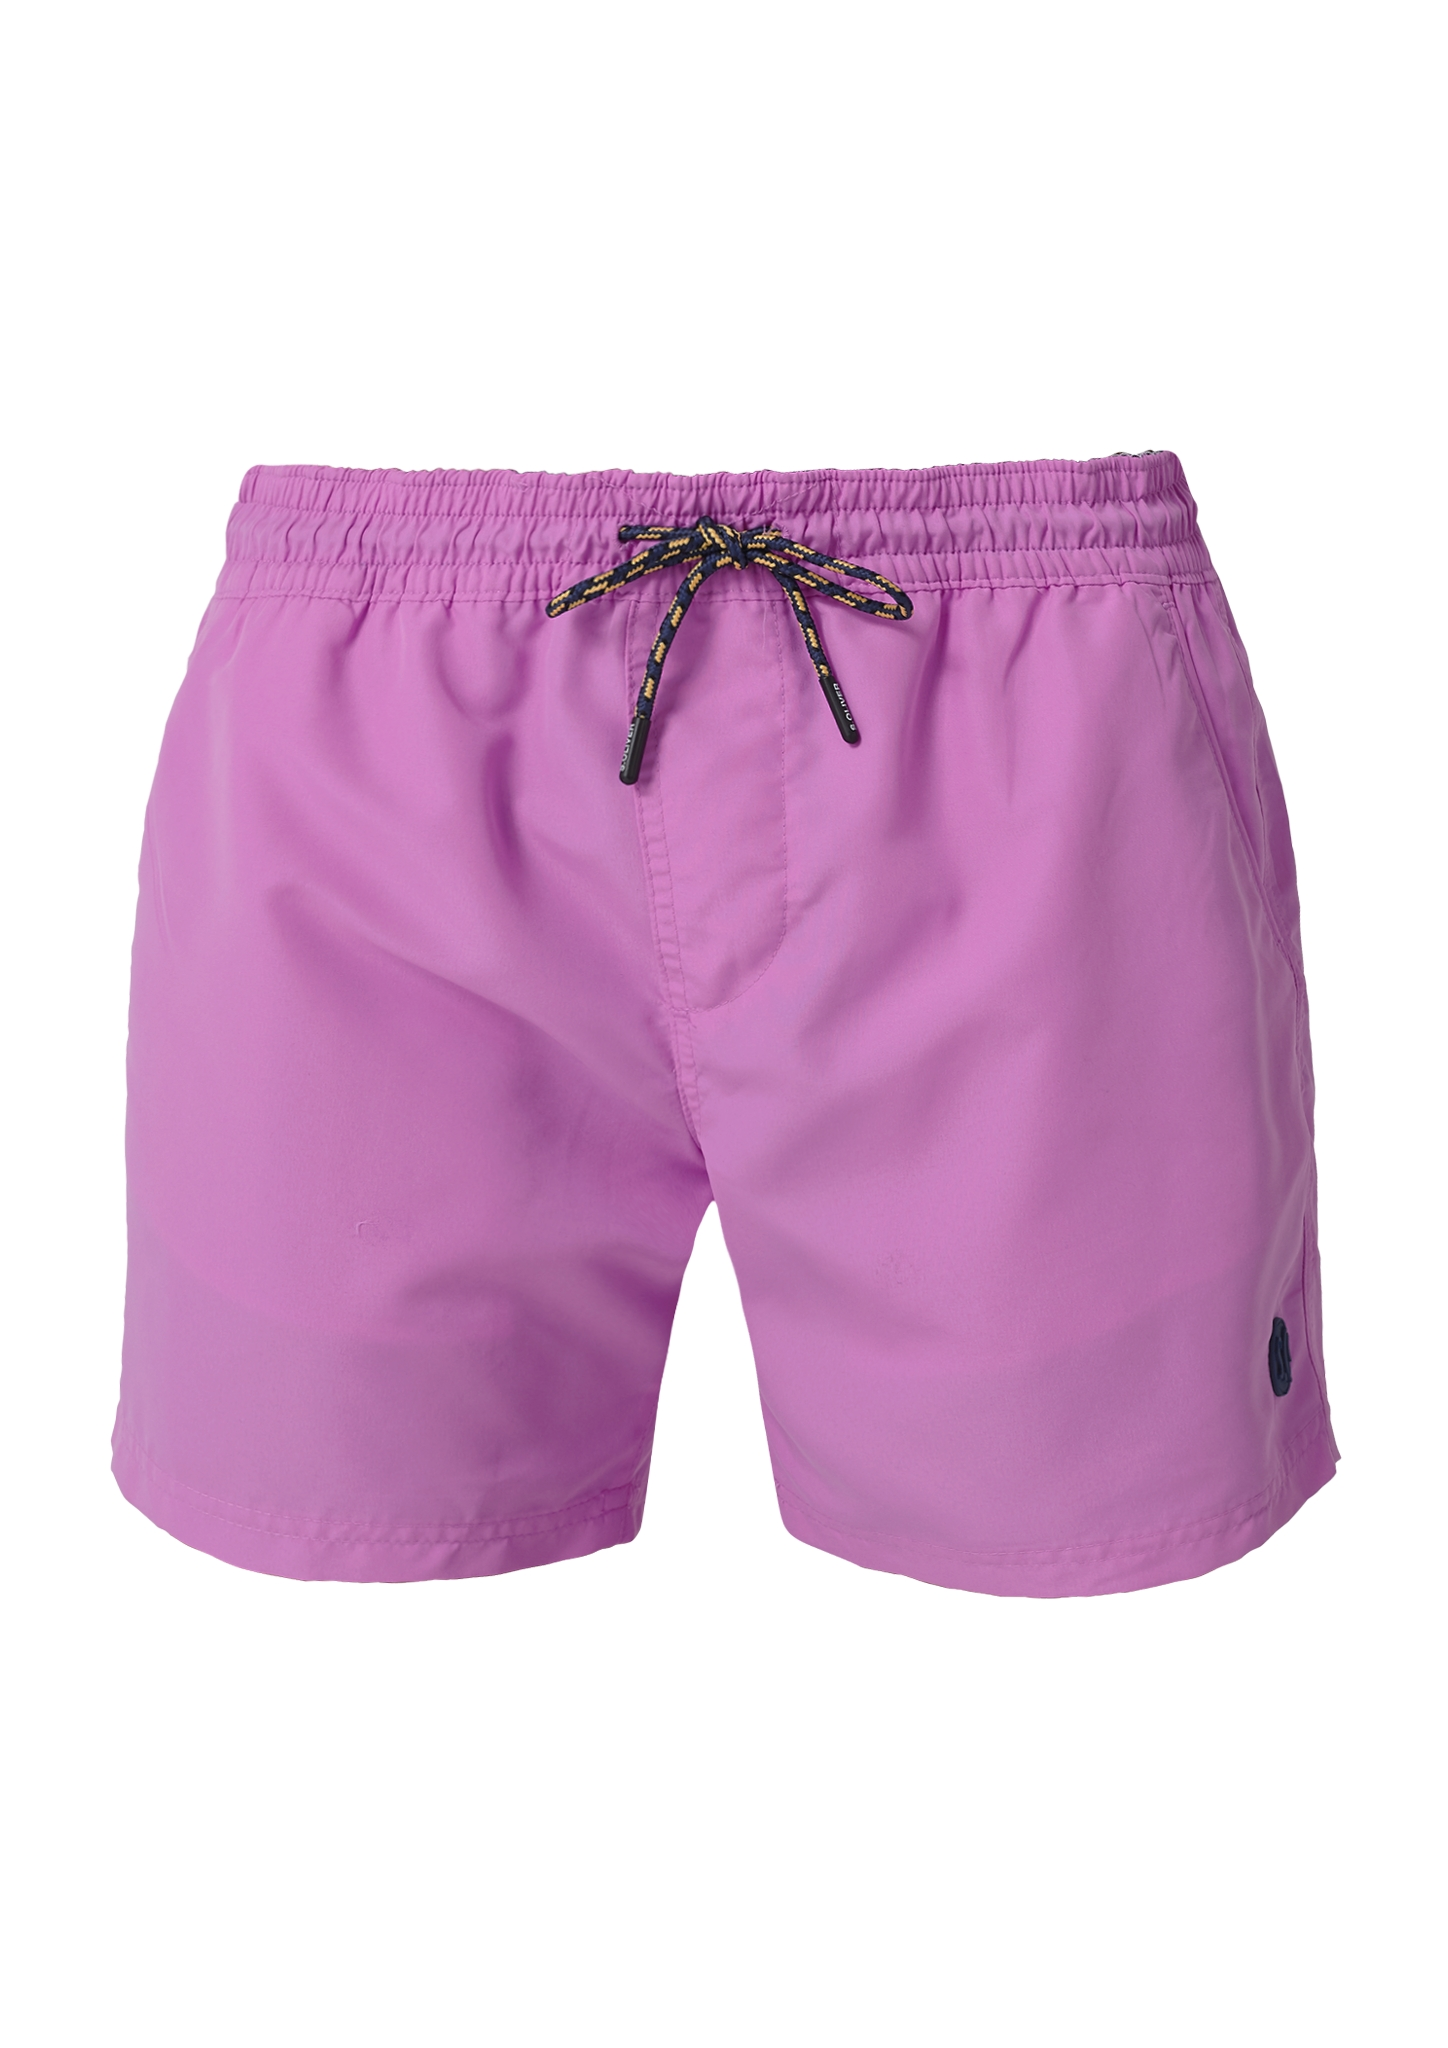 Badehose | Bekleidung > Bademode > Badehosen | Rosa | Oberstoff: 100% polyester| futter: 100% polyester | s.Oliver